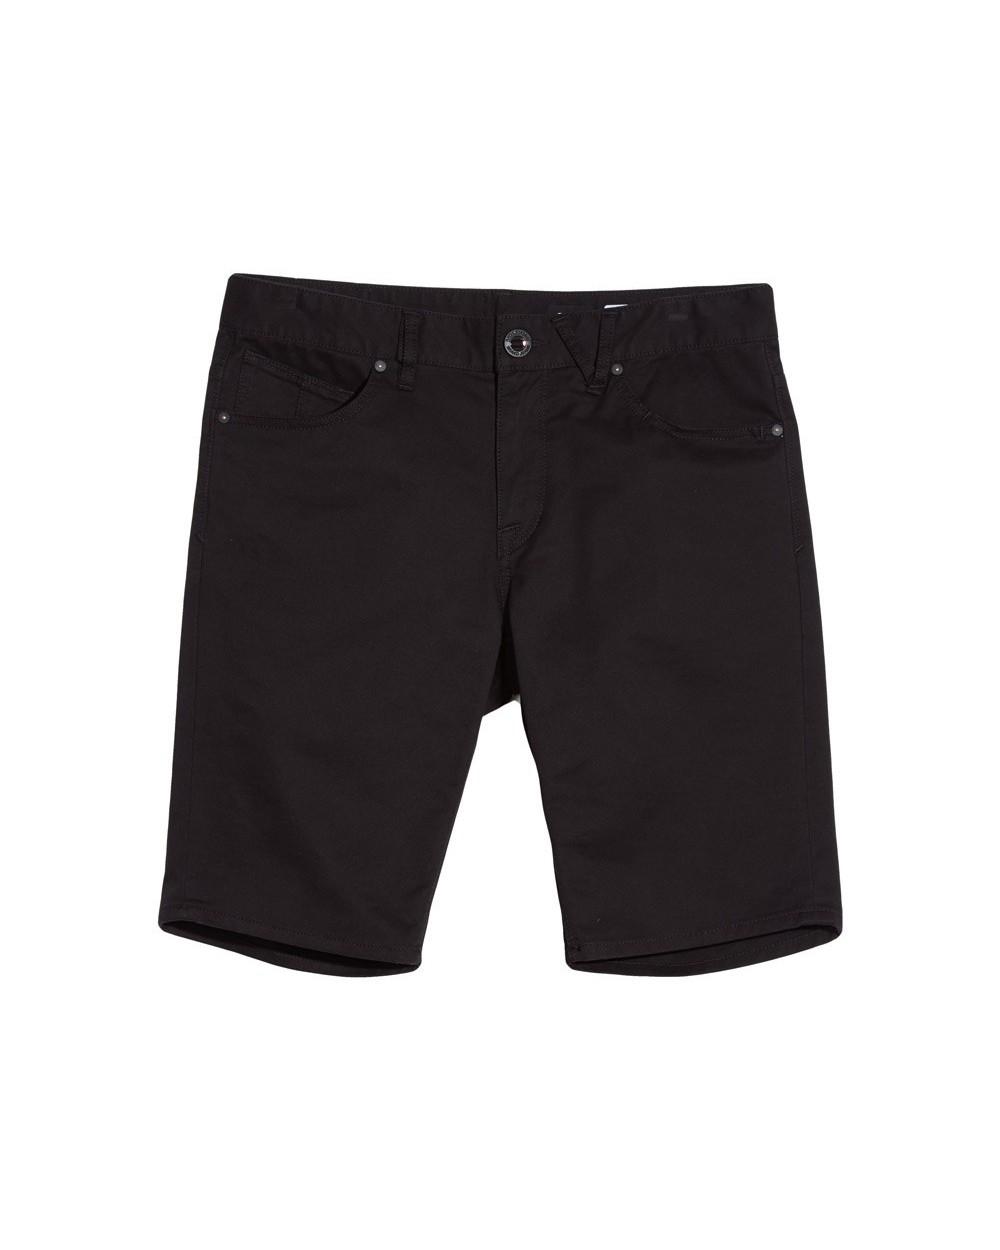 Volcom Solver Lite Twill Short - Black